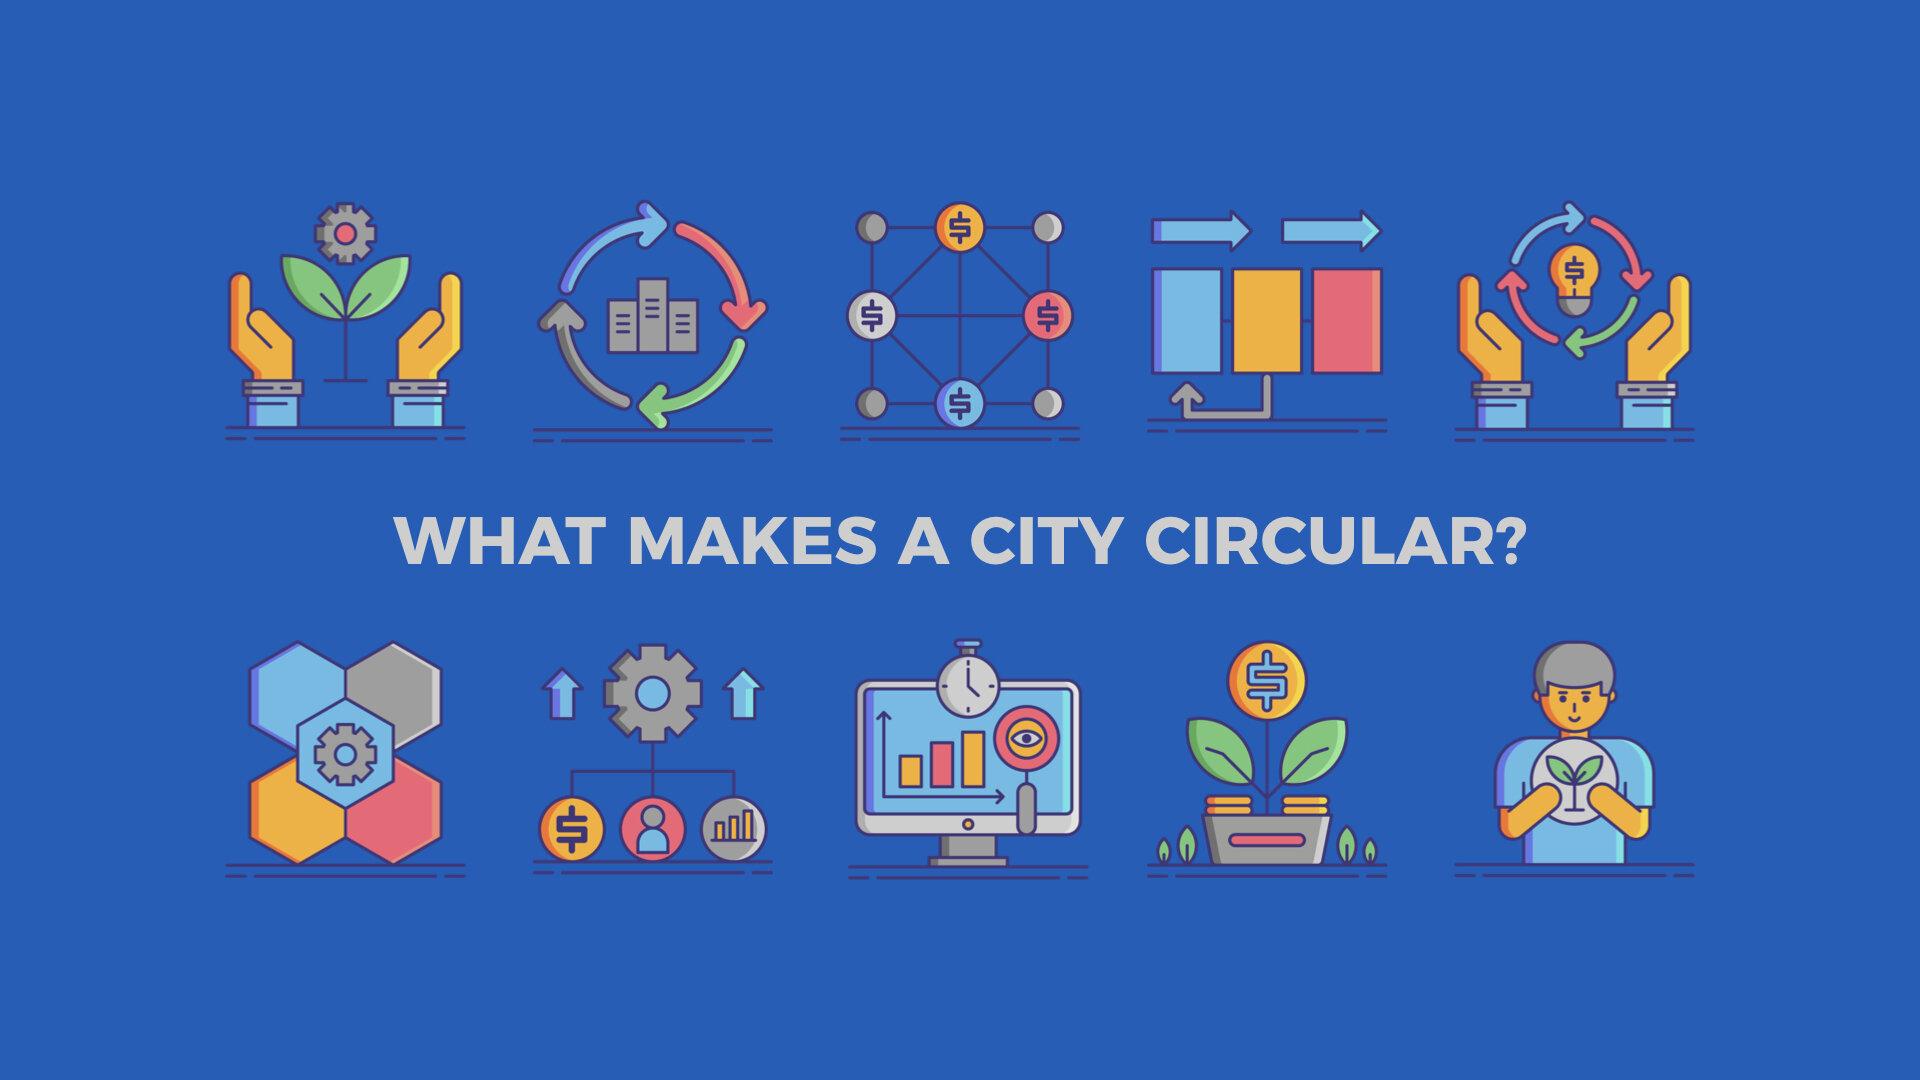 What makes a city circular?